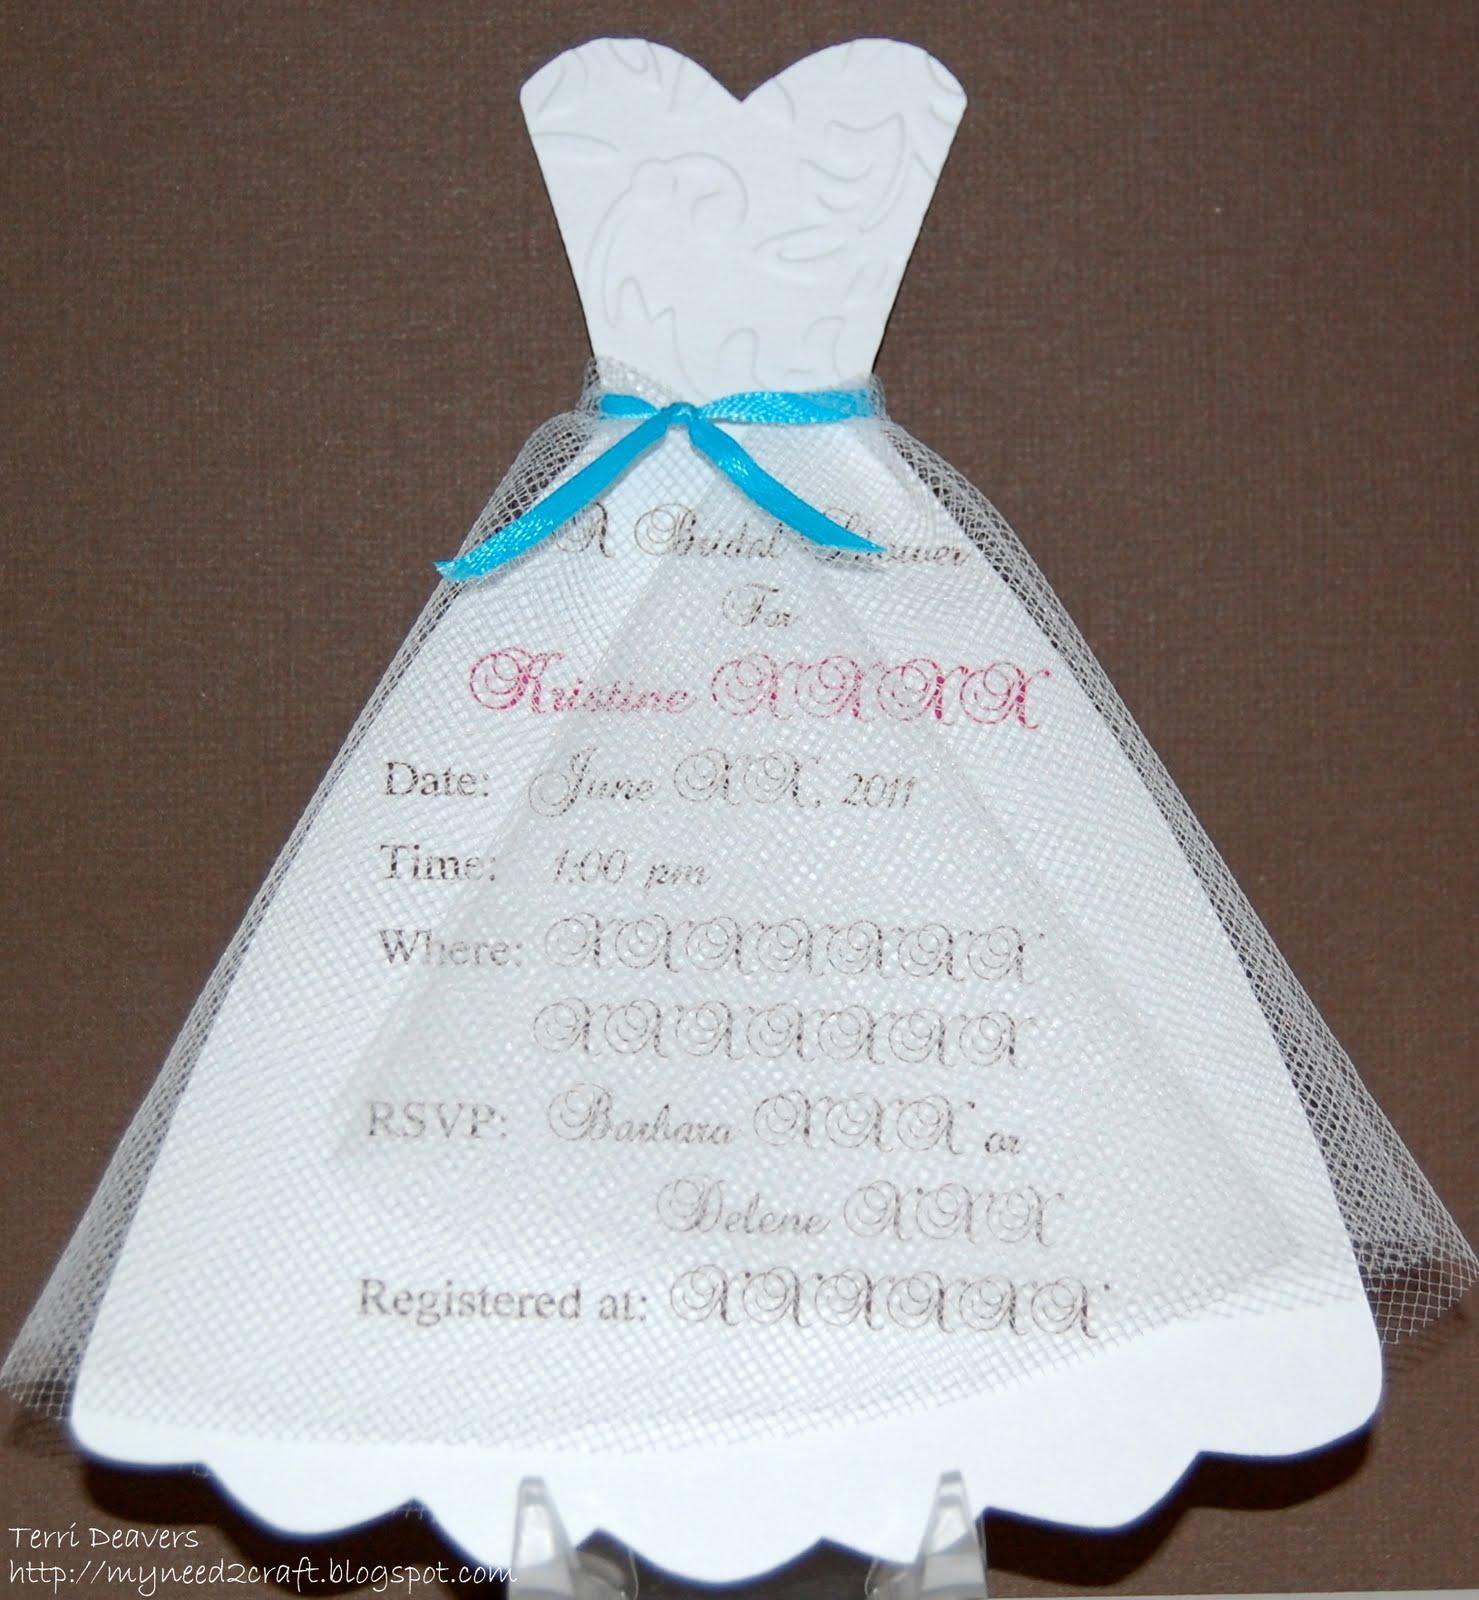 myneed2craft by terri deavers bridal shower invitations. Black Bedroom Furniture Sets. Home Design Ideas